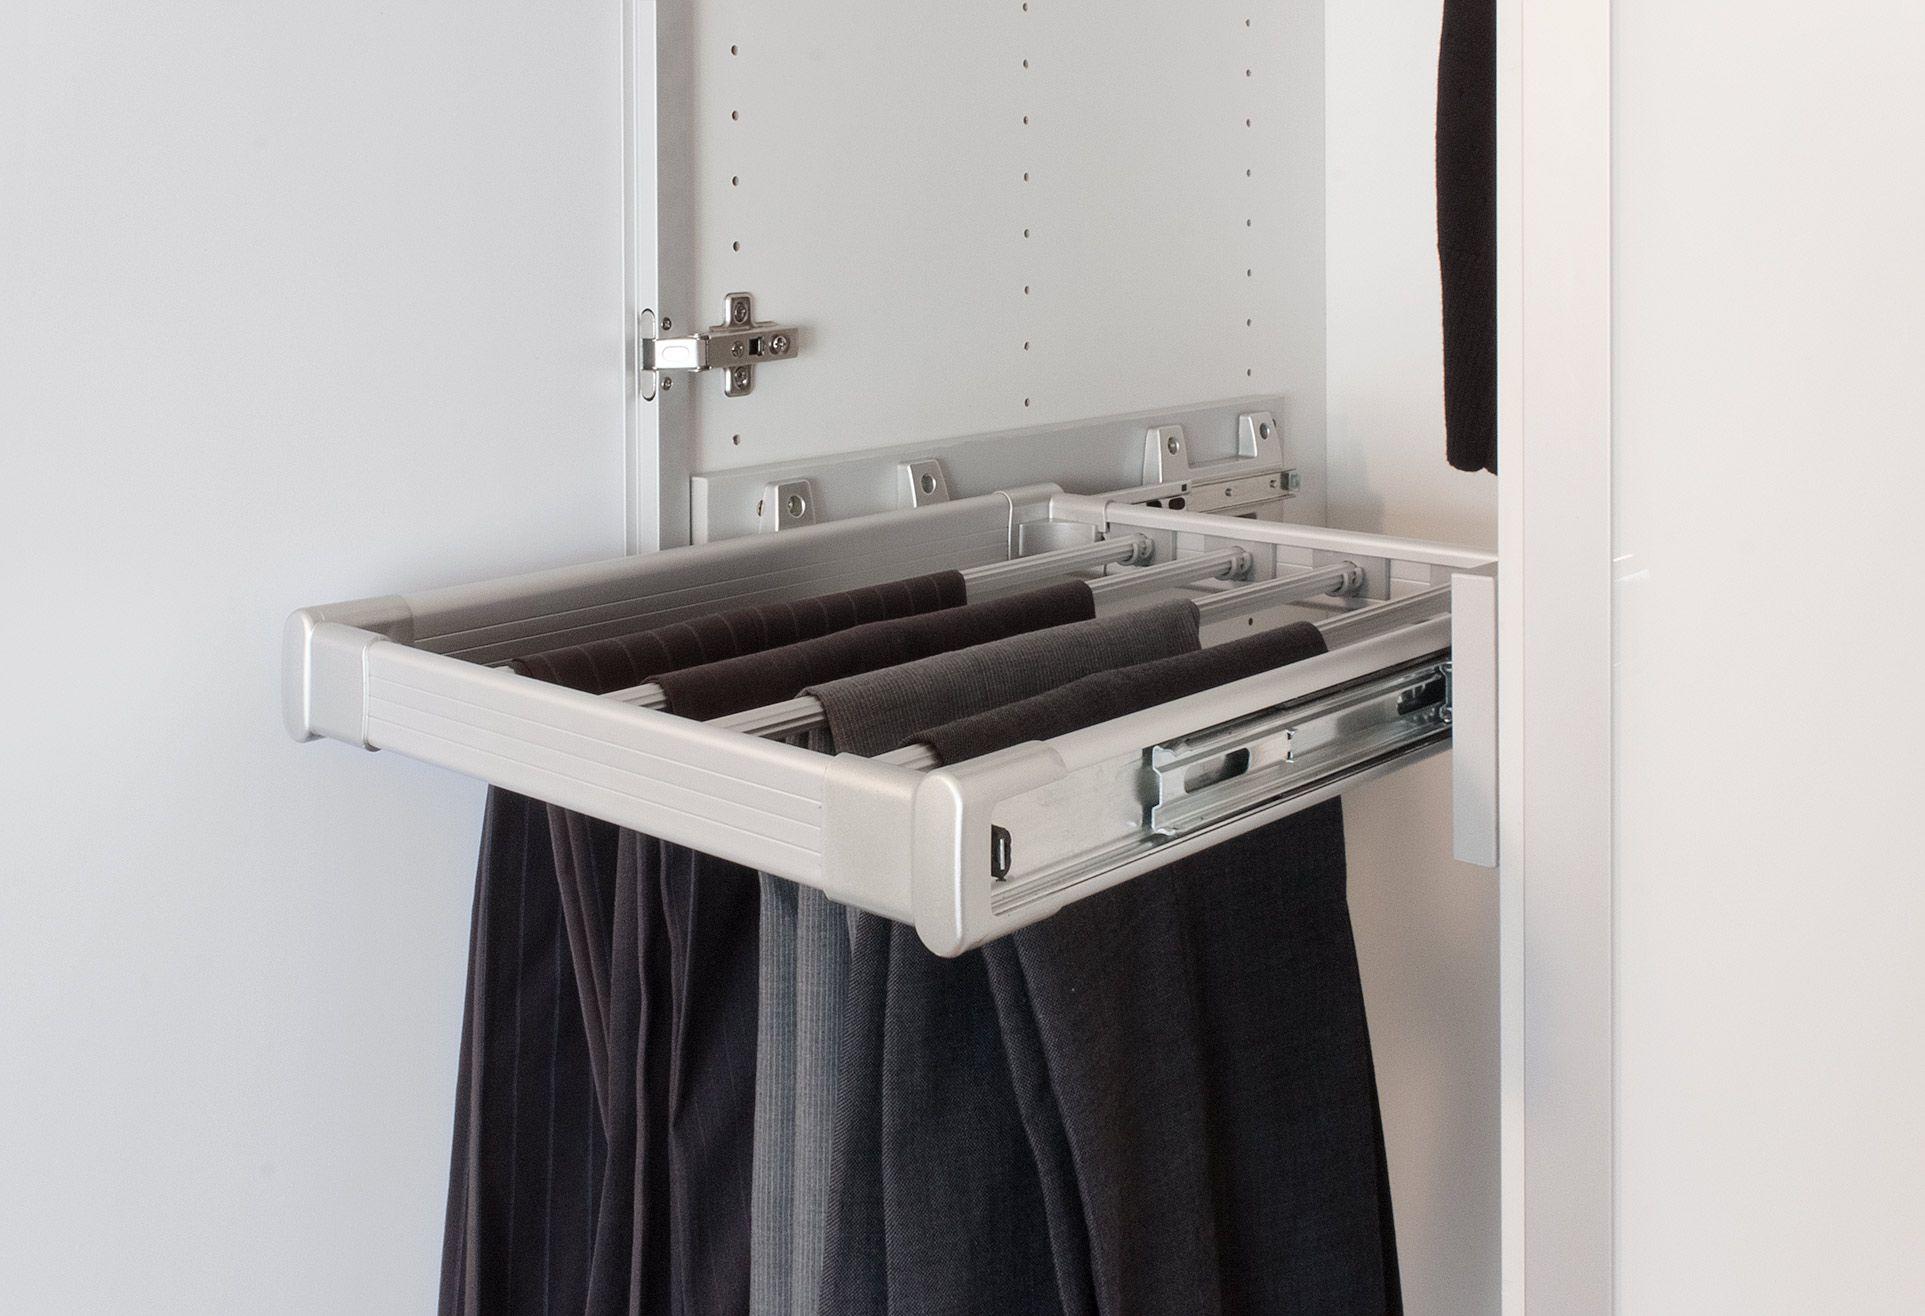 Slide out trouser rack for flatpax wardrobe wardrobeinterior